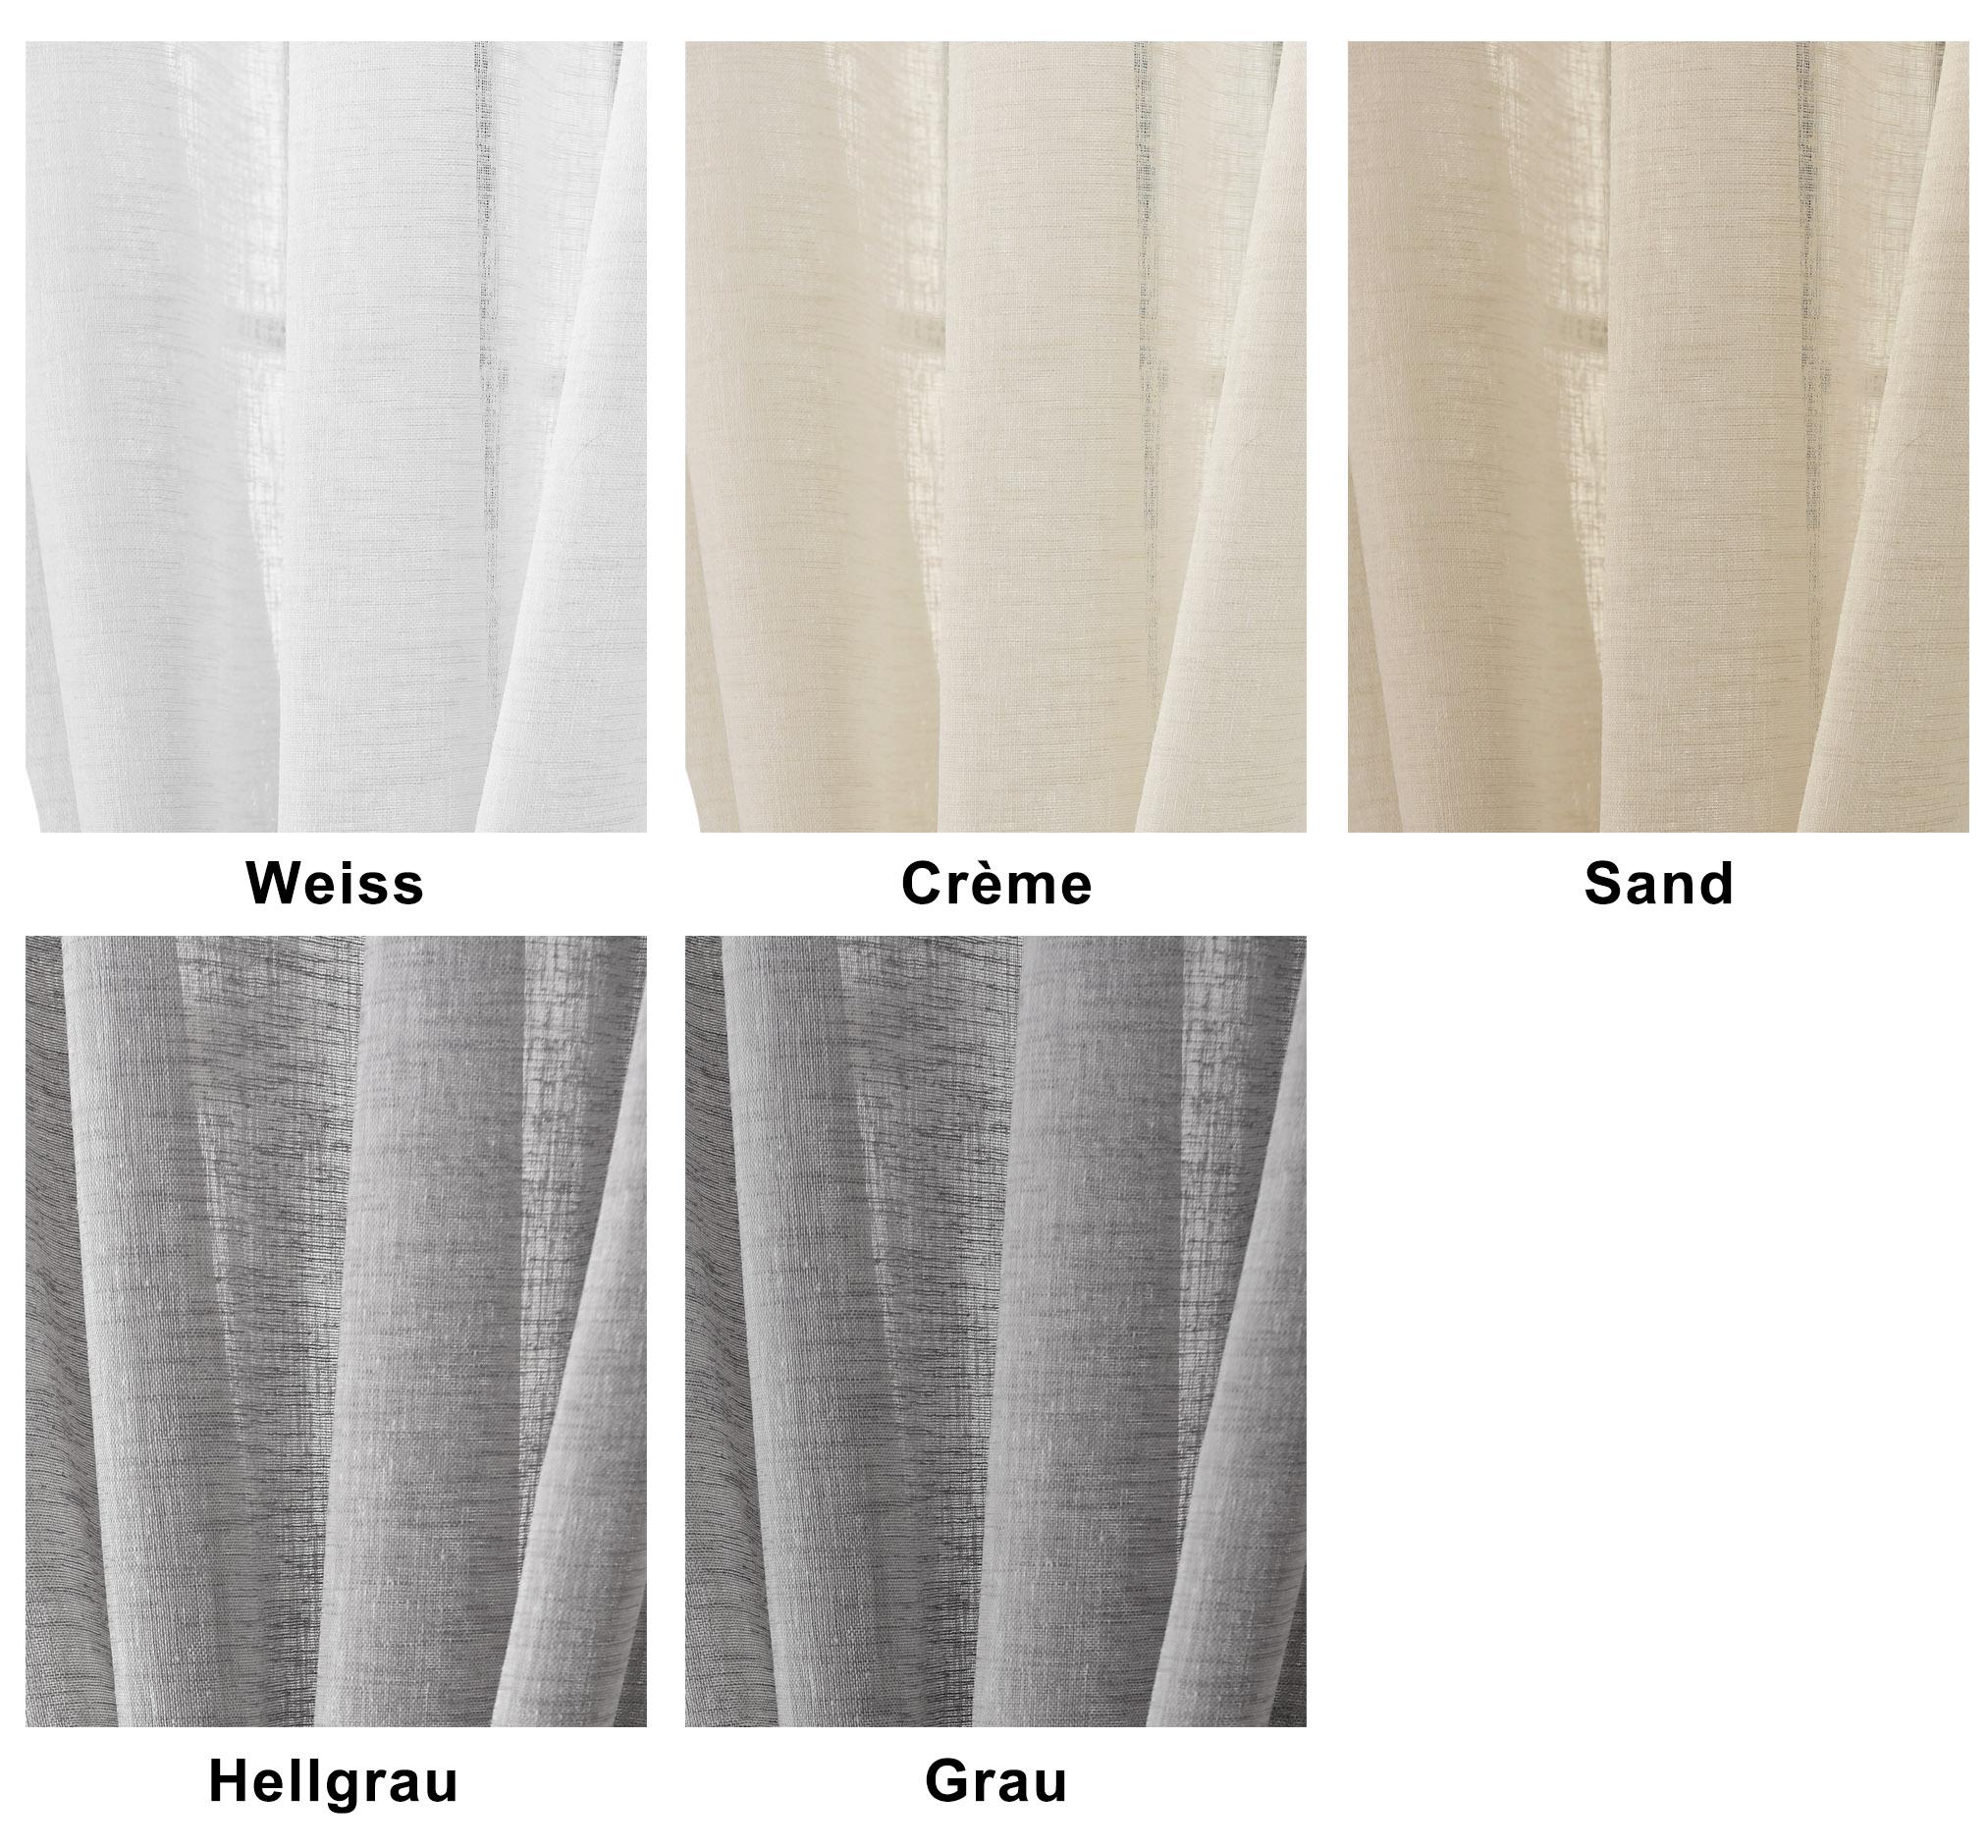 gardinen stores transparent leinen optik schlaufenschal vorhang schal voile 632 ebay. Black Bedroom Furniture Sets. Home Design Ideas